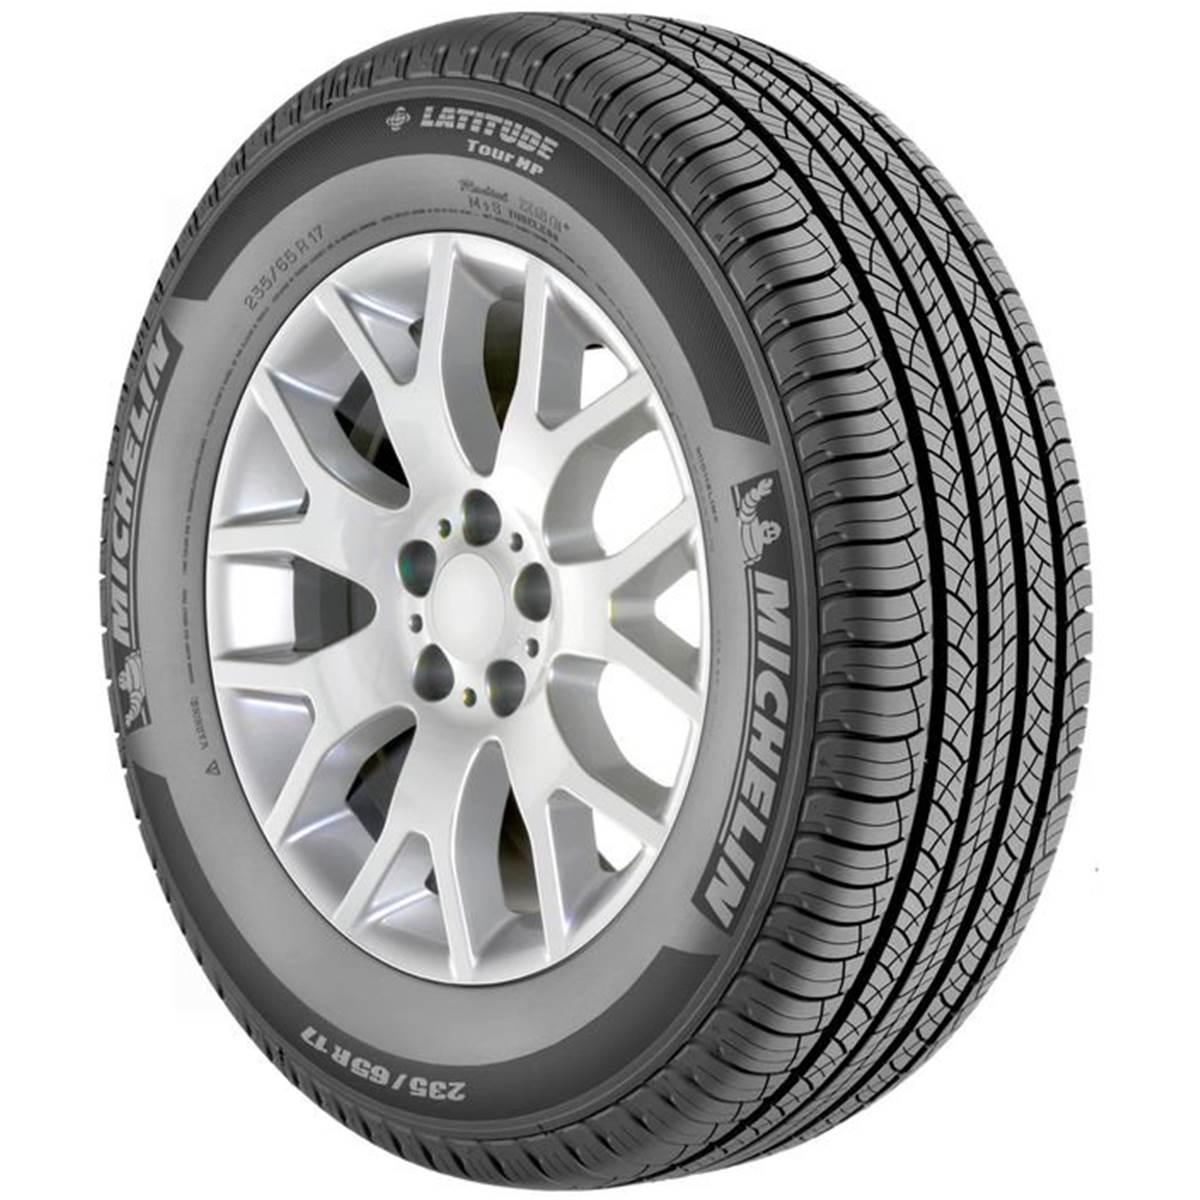 Michelin Latitude Tour HP pneu